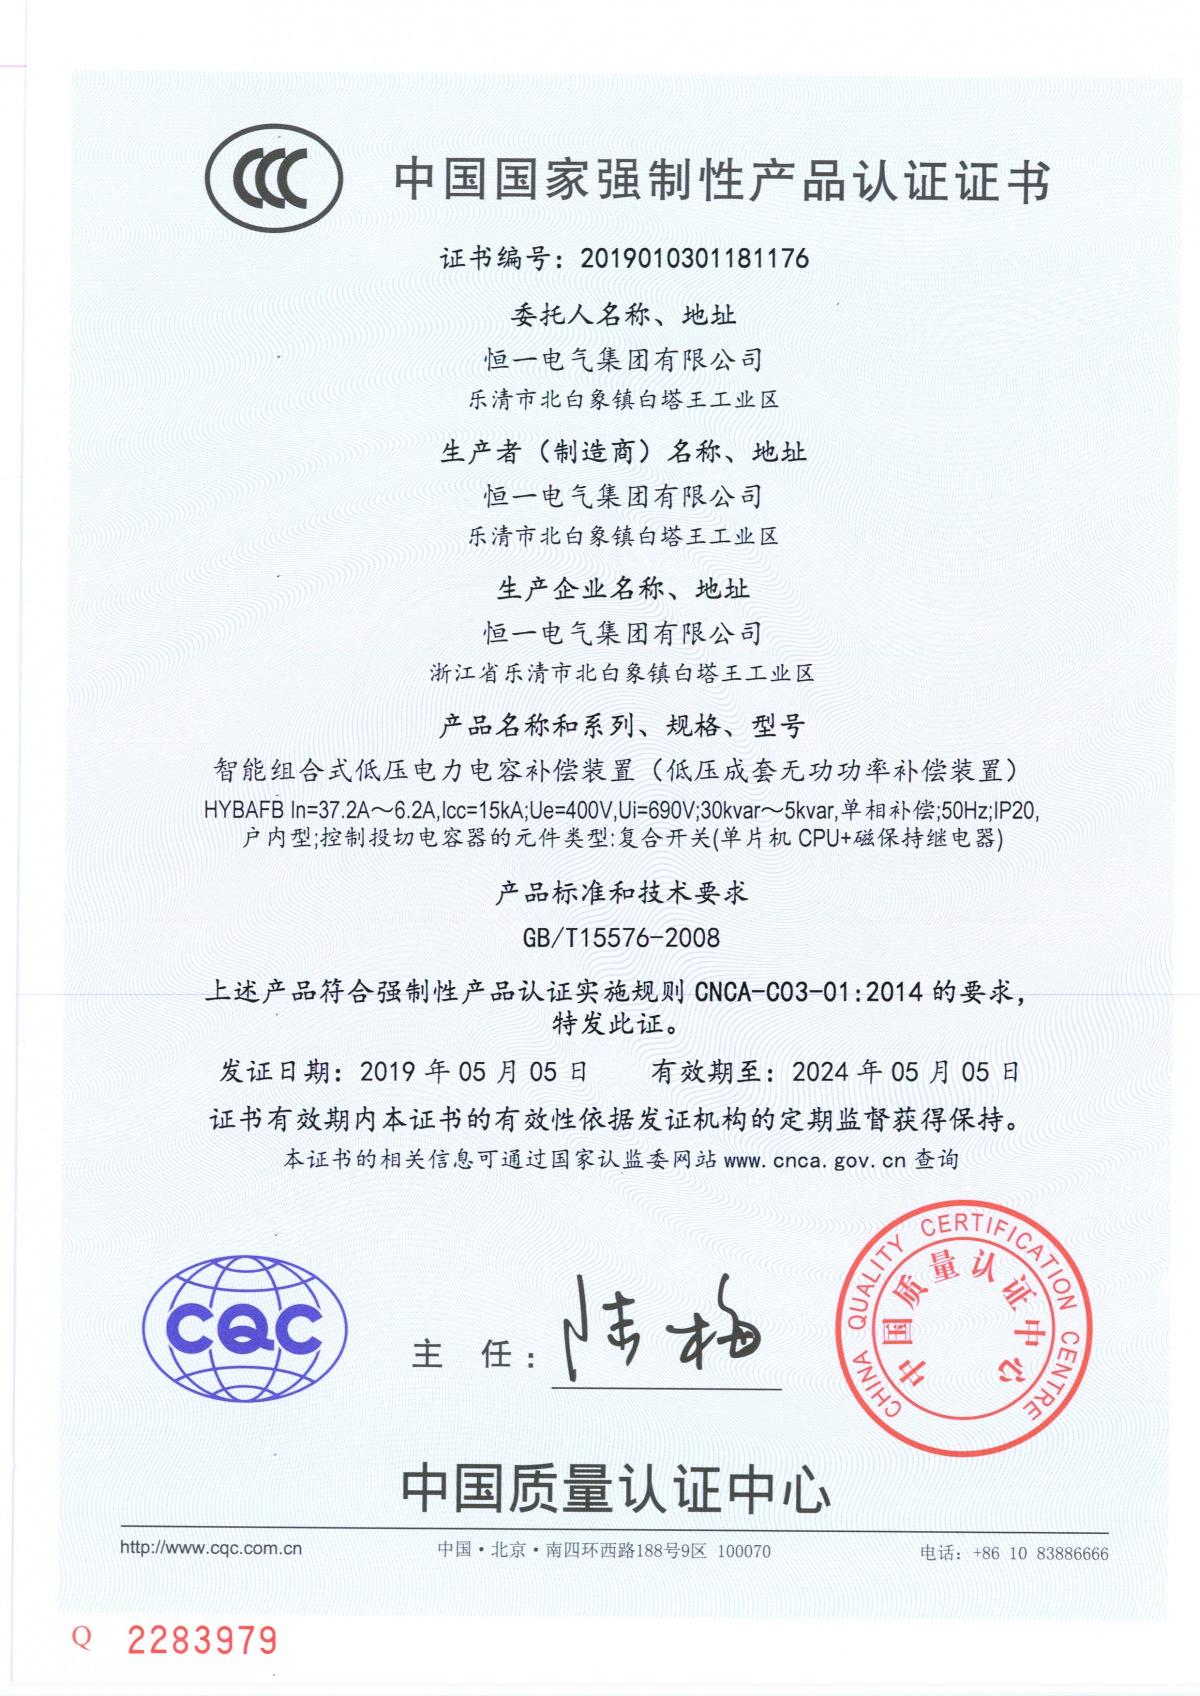 HYBAFB 15KA 中文